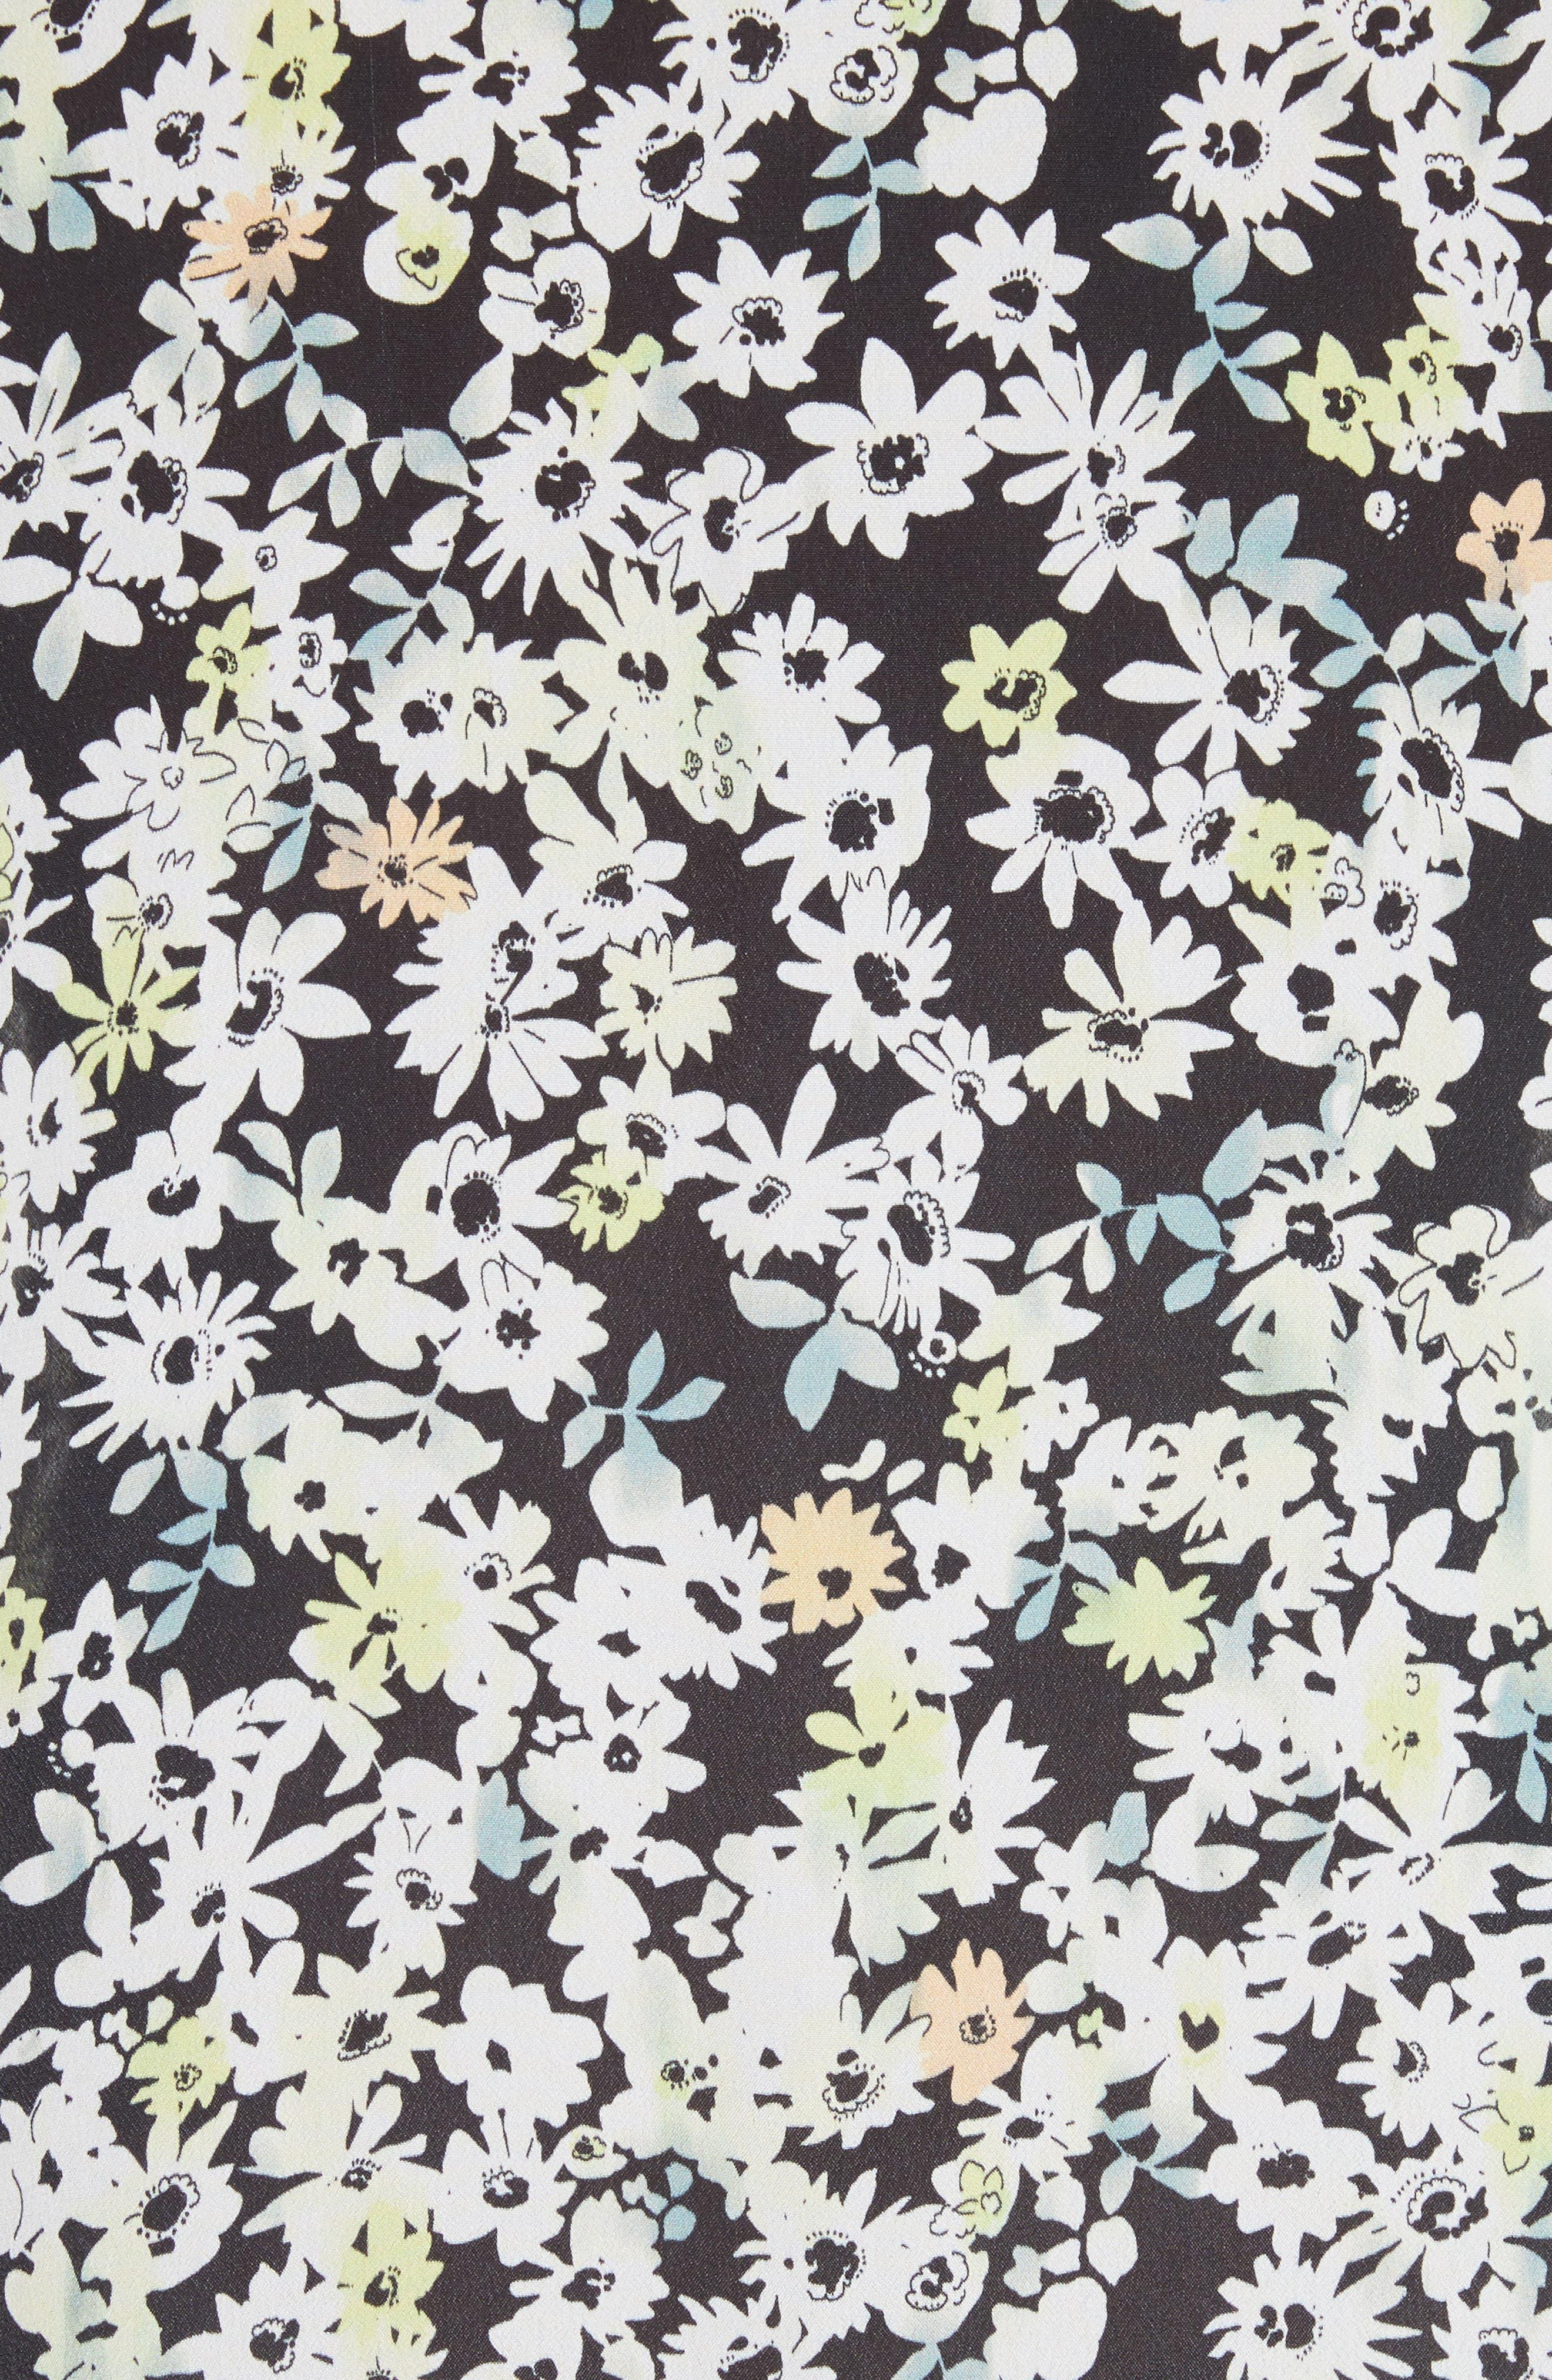 Floral Print Flutter Edge Dress,                             Alternate thumbnail 5, color,                             Multicolor Grey